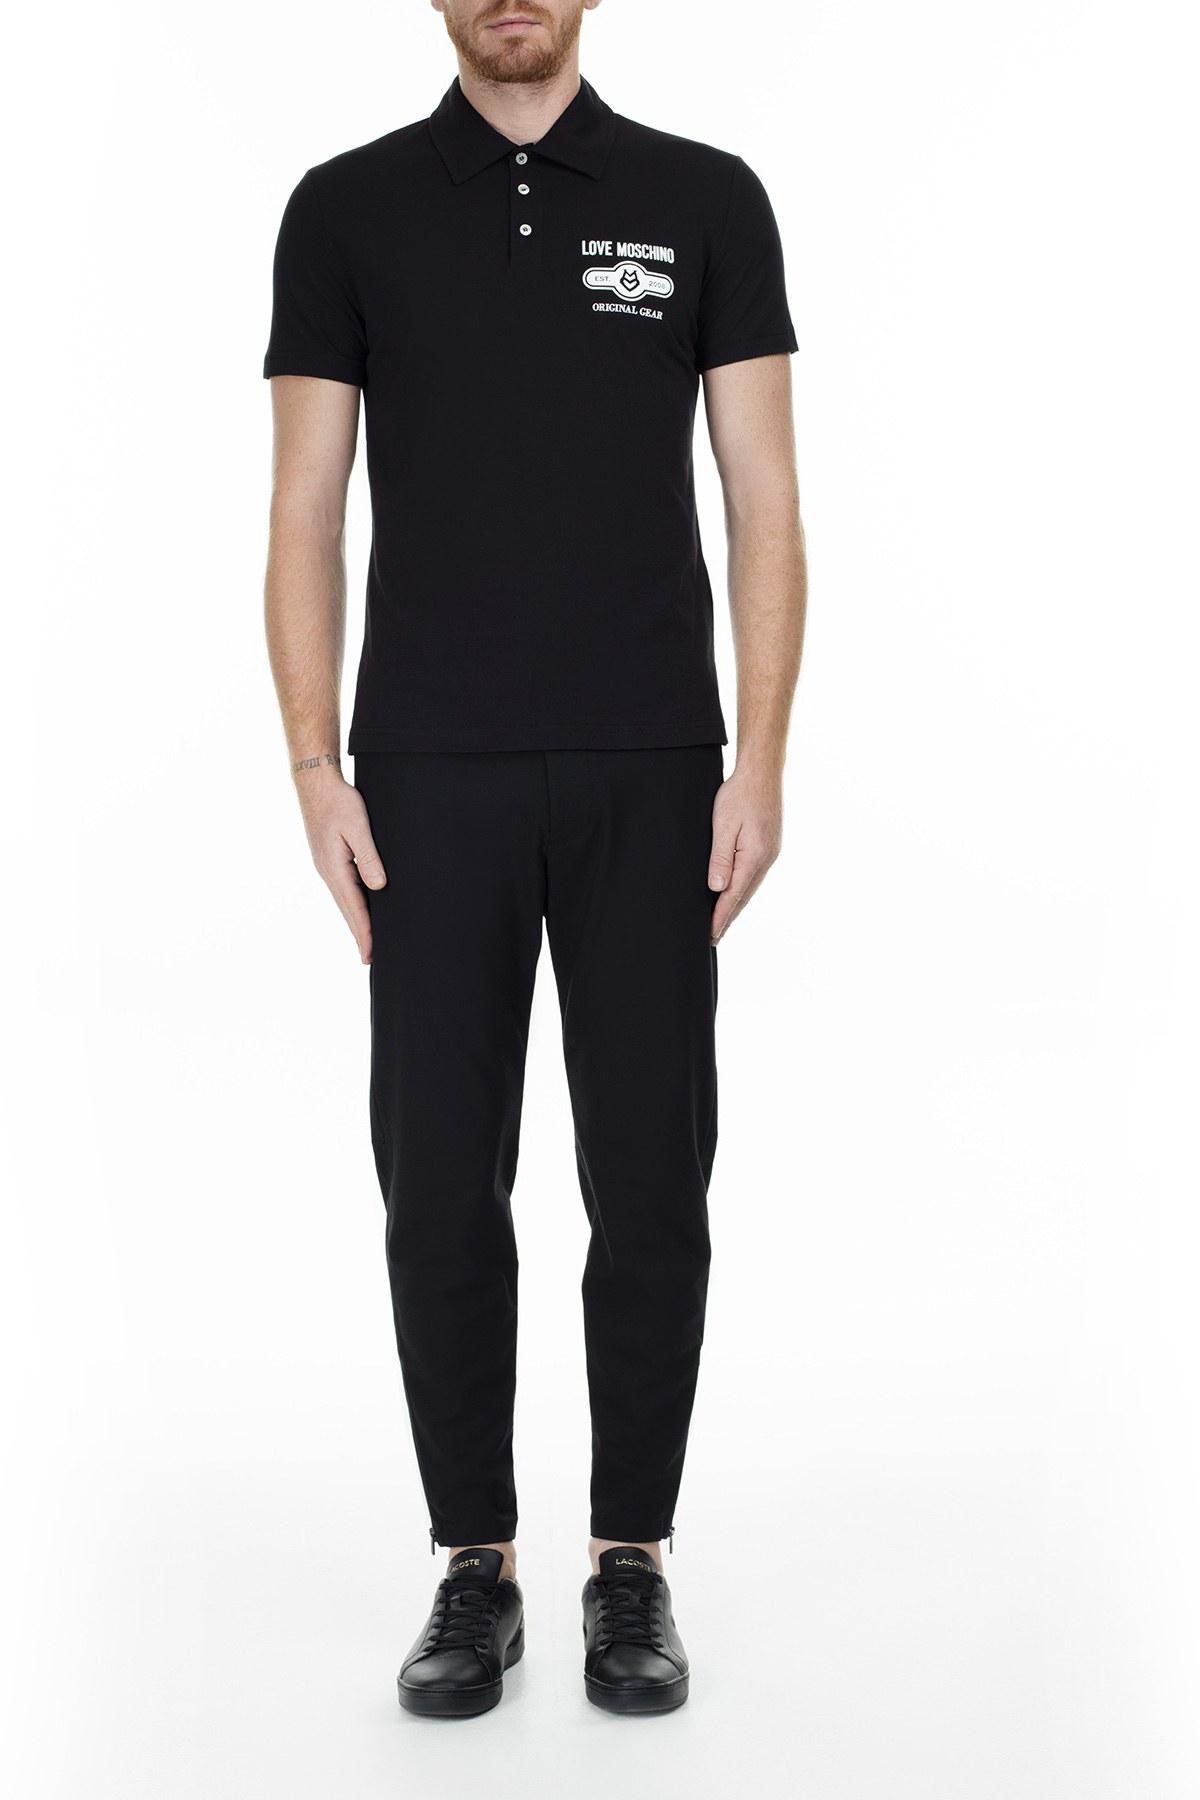 Love Moschino T Shirt Erkek Polo S M831803M3876 C74 SİYAH